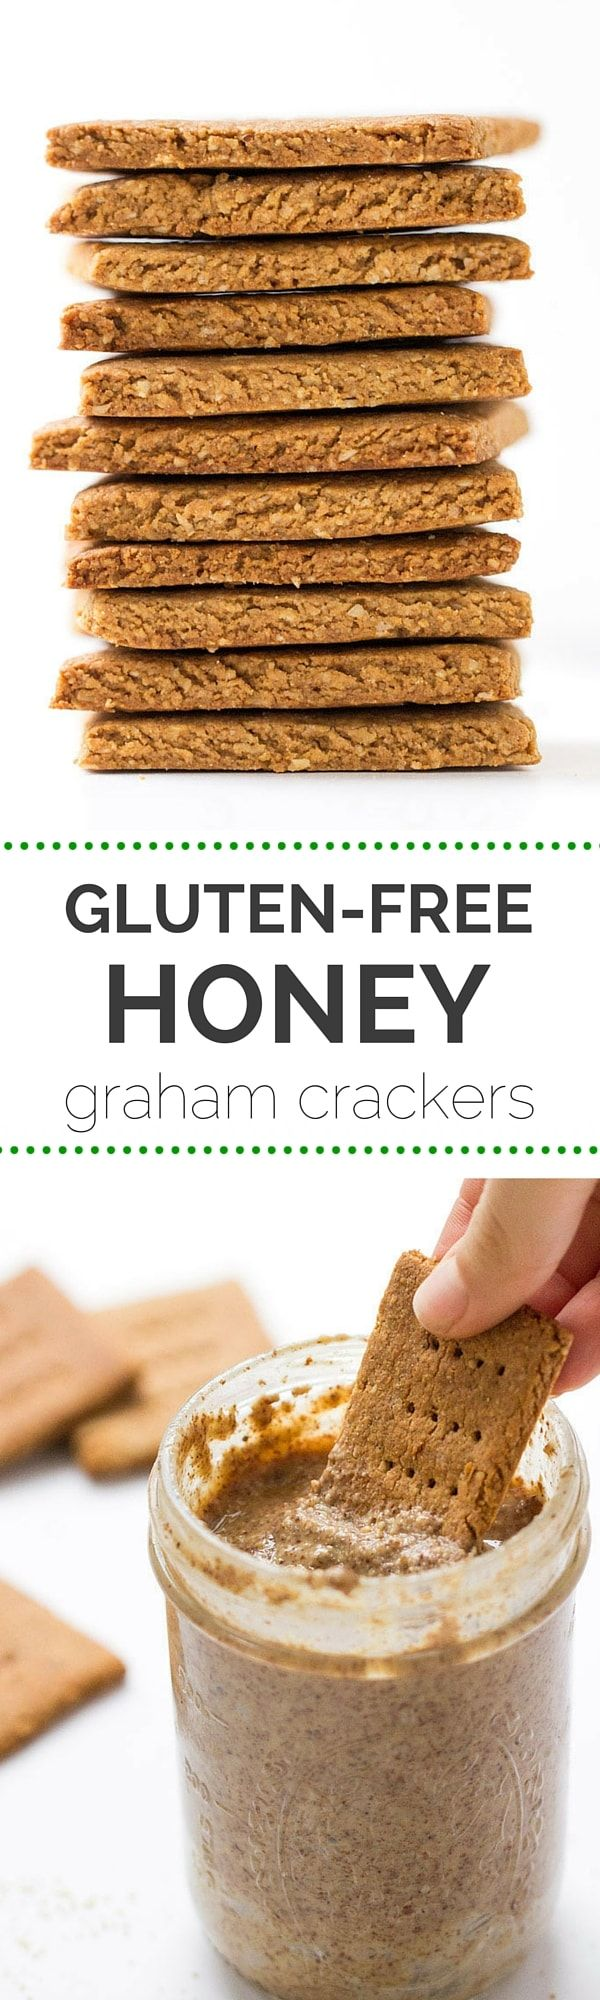 17 Best ideas about Honey Grahams on Pinterest | Graham ...